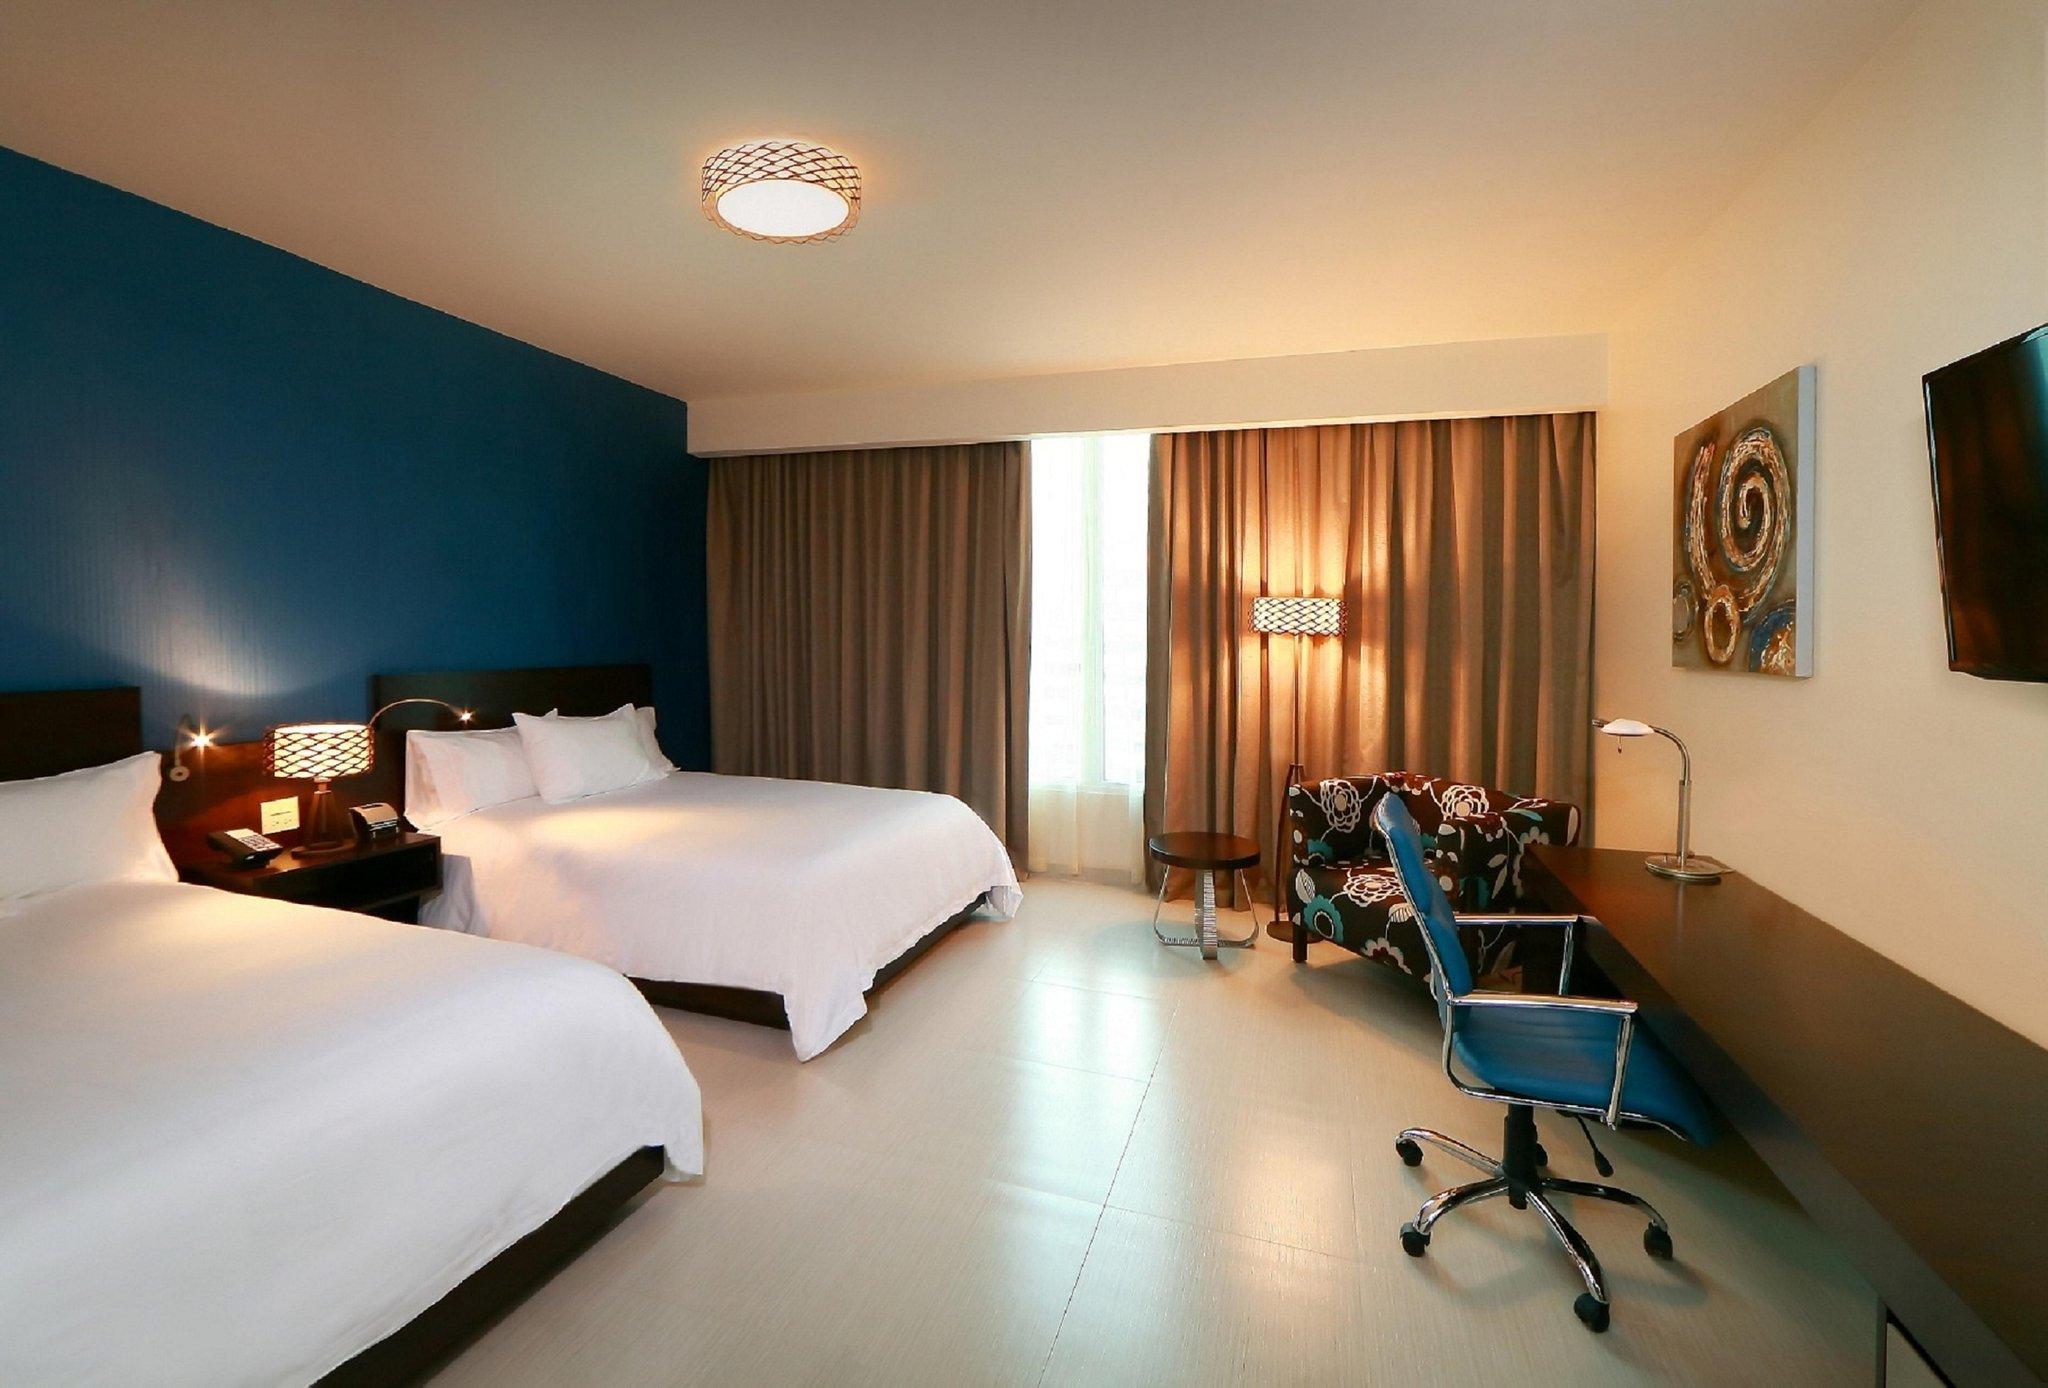 Hampton By Hilton Panama UPDATED 2017 Hotel Reviews & Price